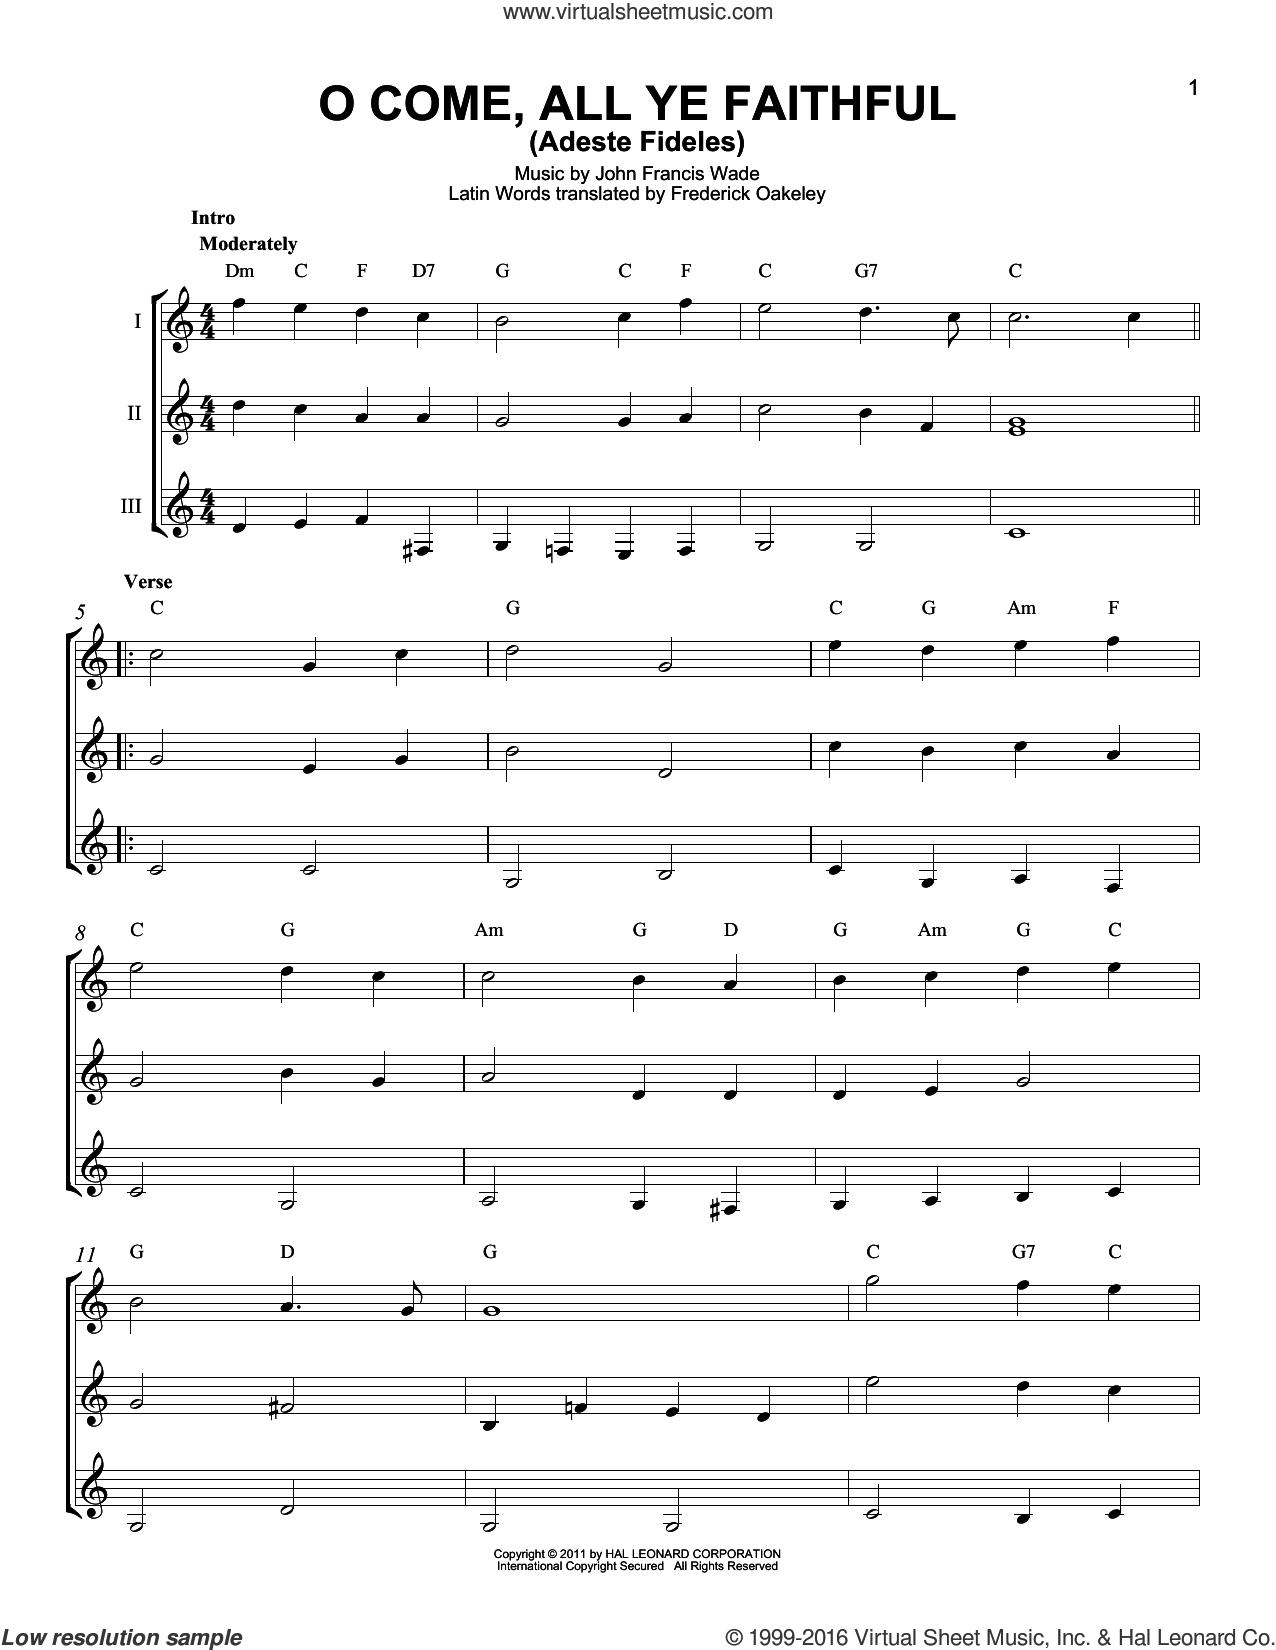 O Come, All Ye Faithful (Adeste Fideles) sheet music for guitar ensemble by John Francis Wade and Frederick Oakeley (English), intermediate skill level